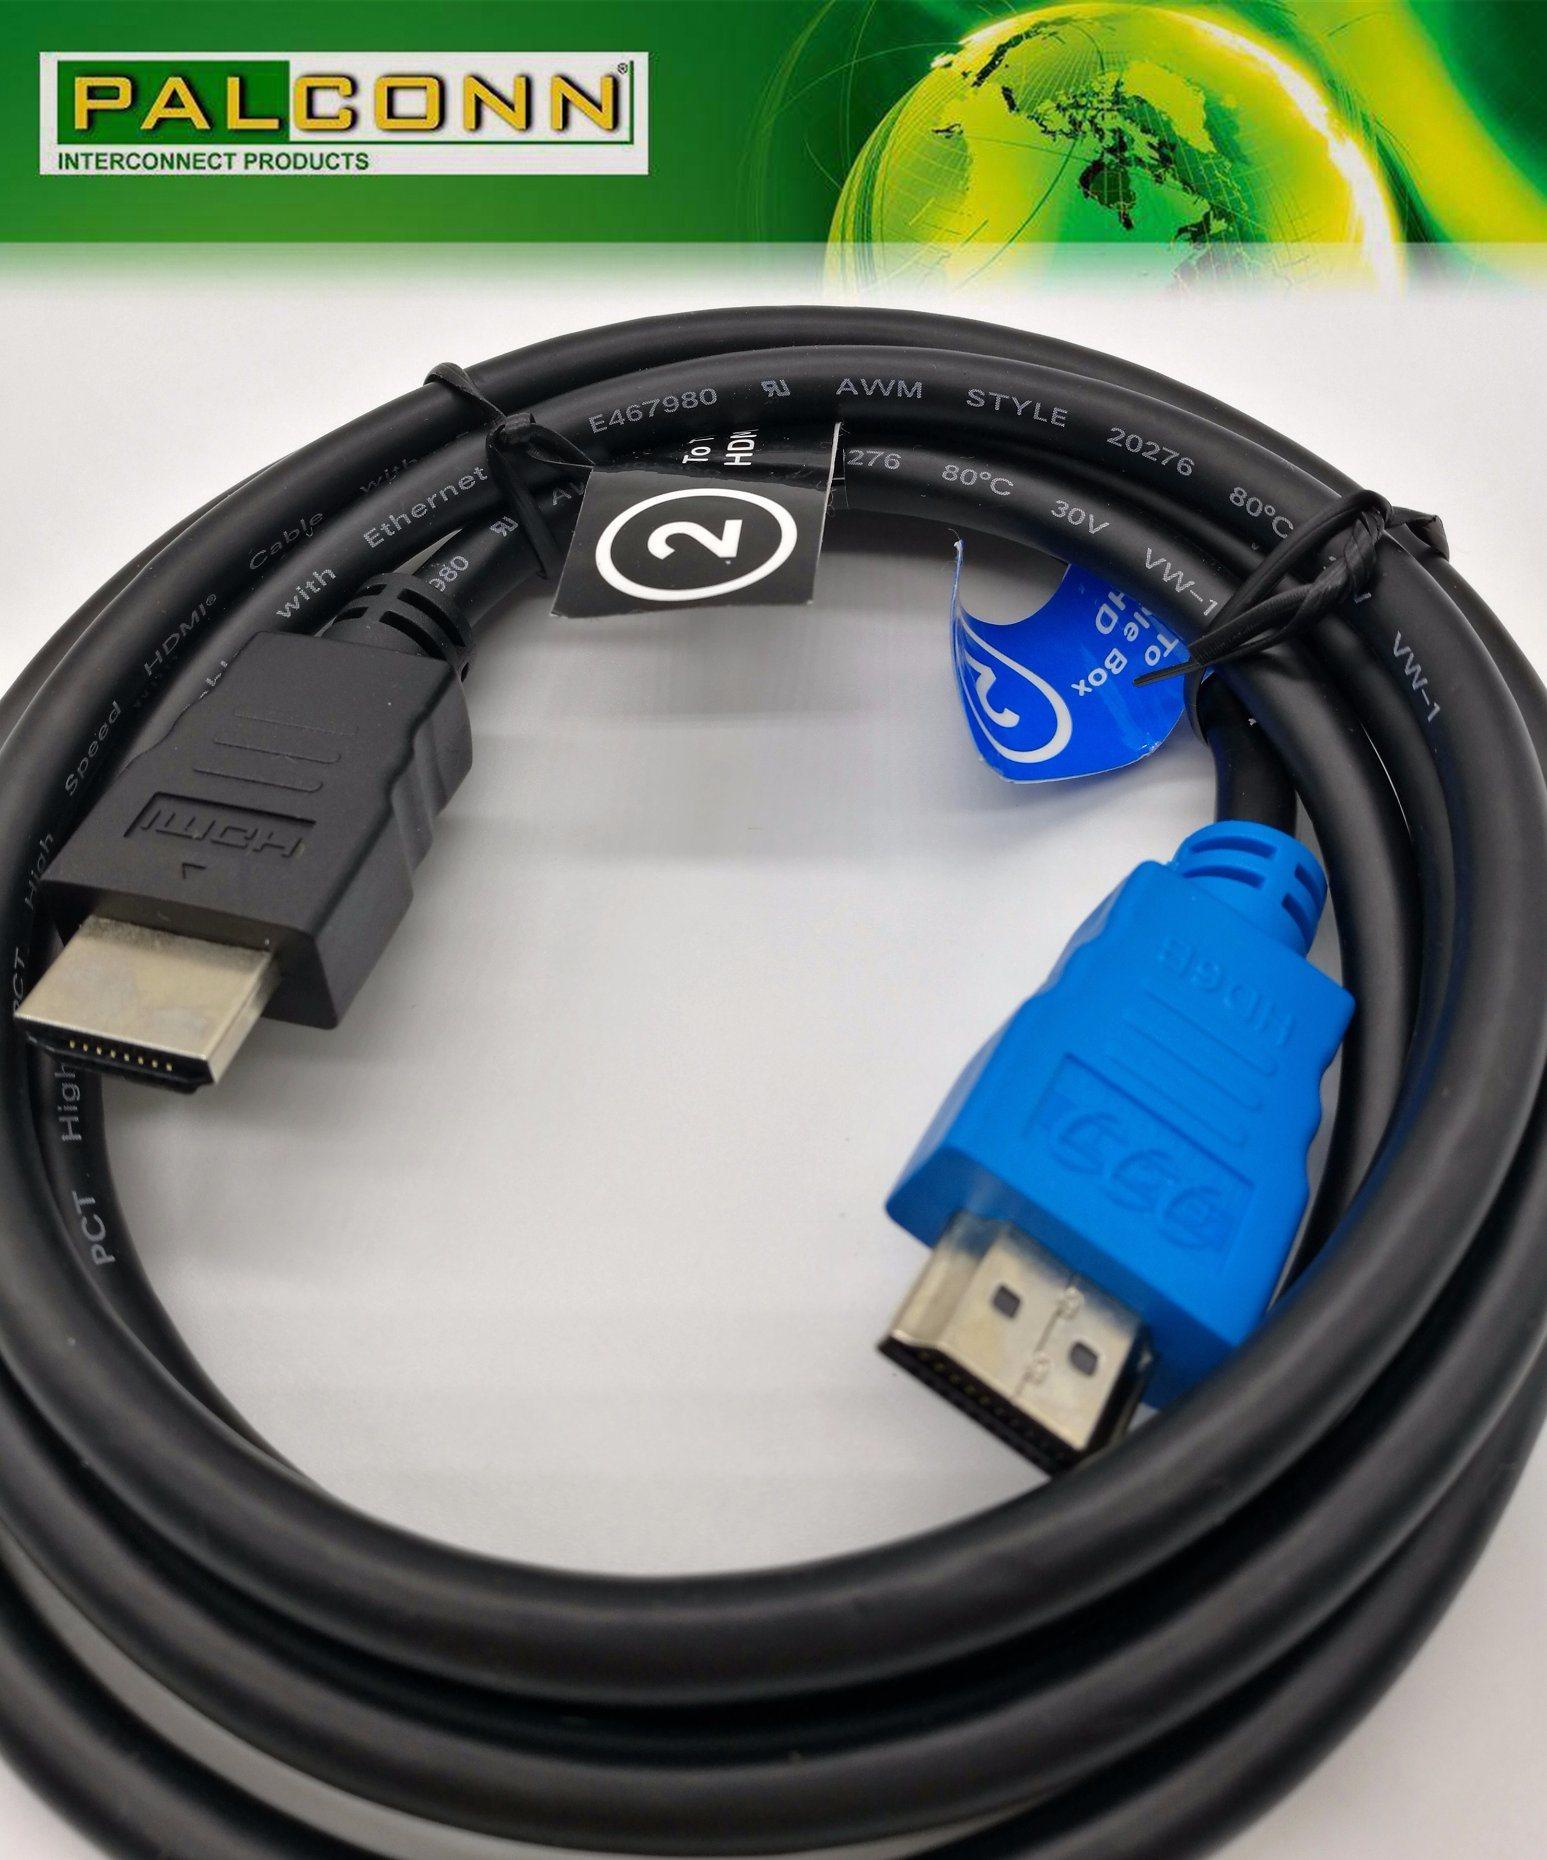 HDMI2.0 Cable